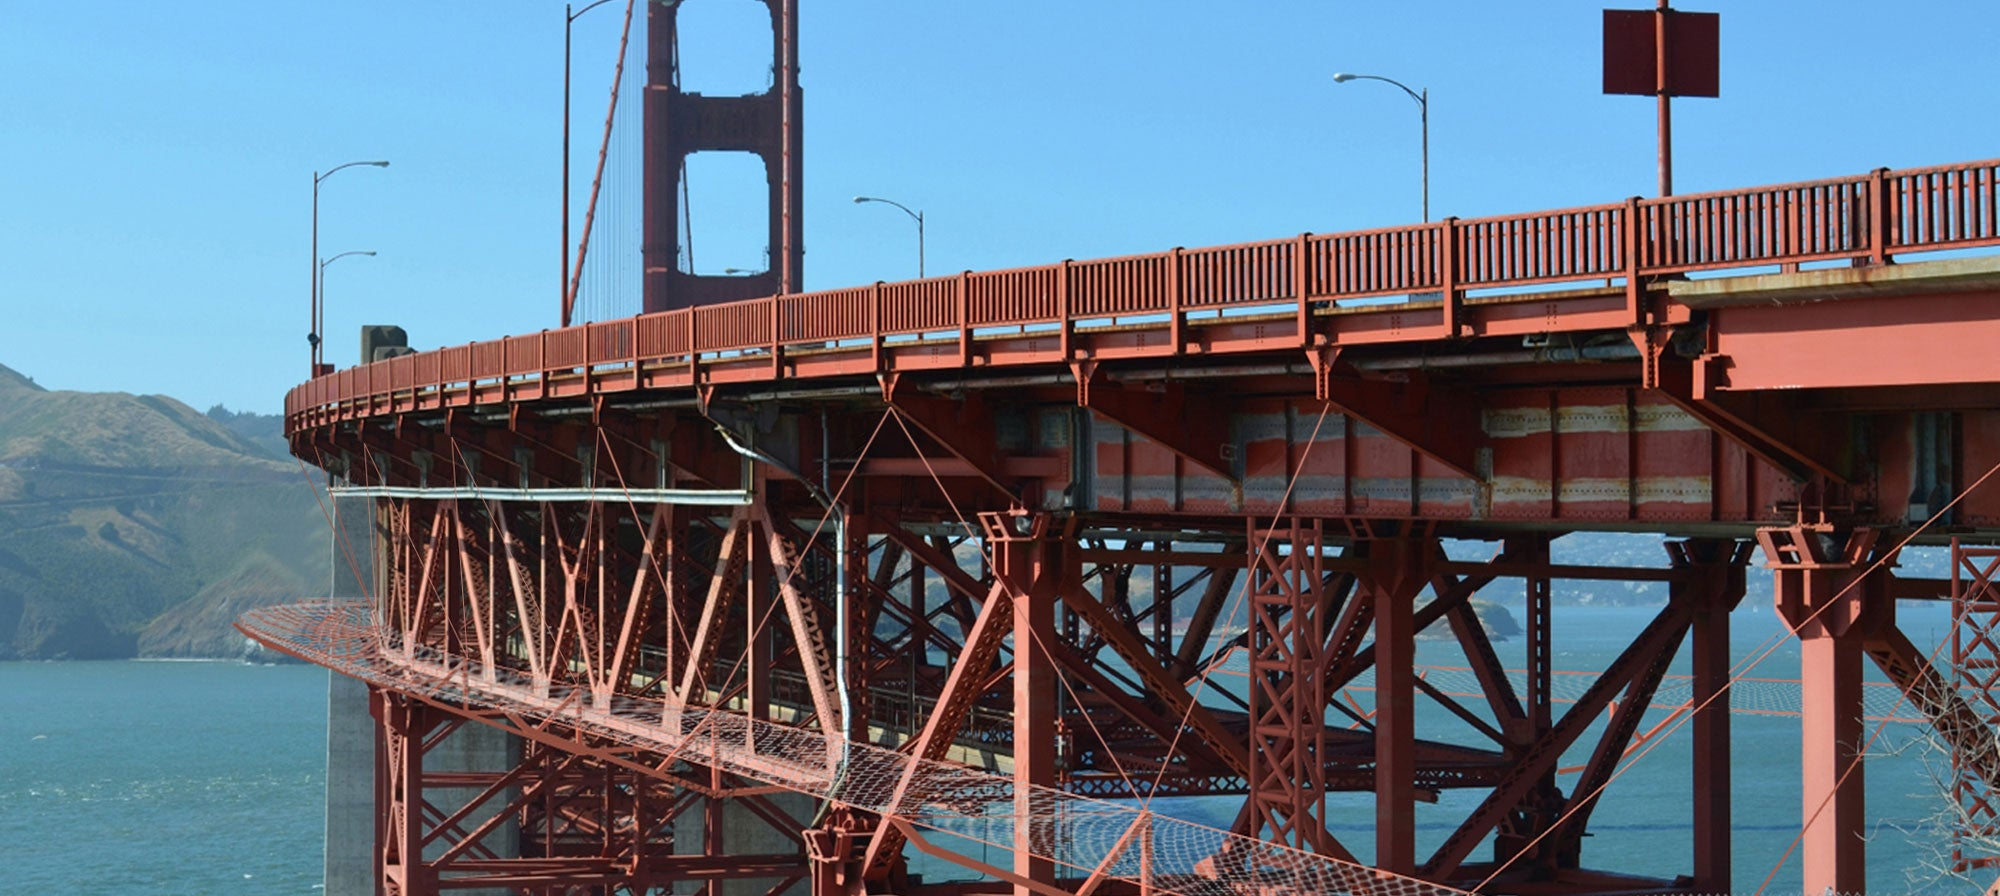 A rendering of the Golden Gate Bridge suicide barrier